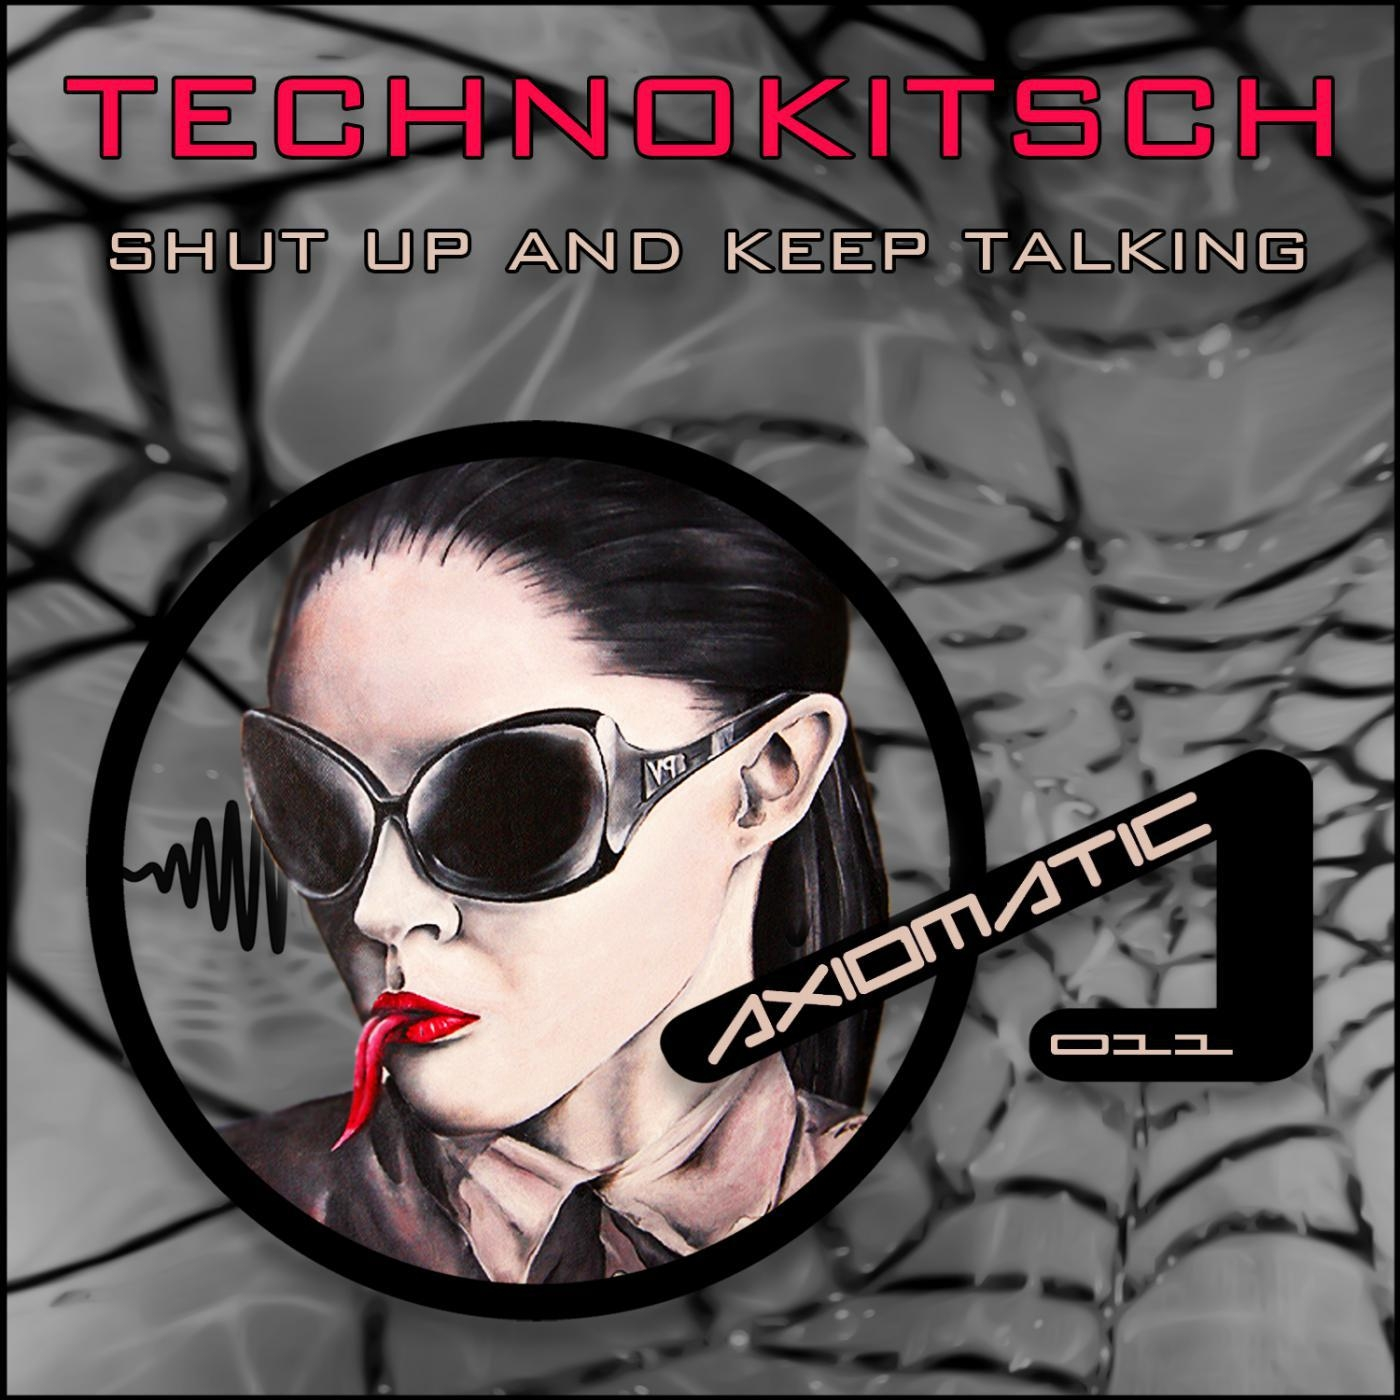 Technokitsch - Stone Swim (Original mix)